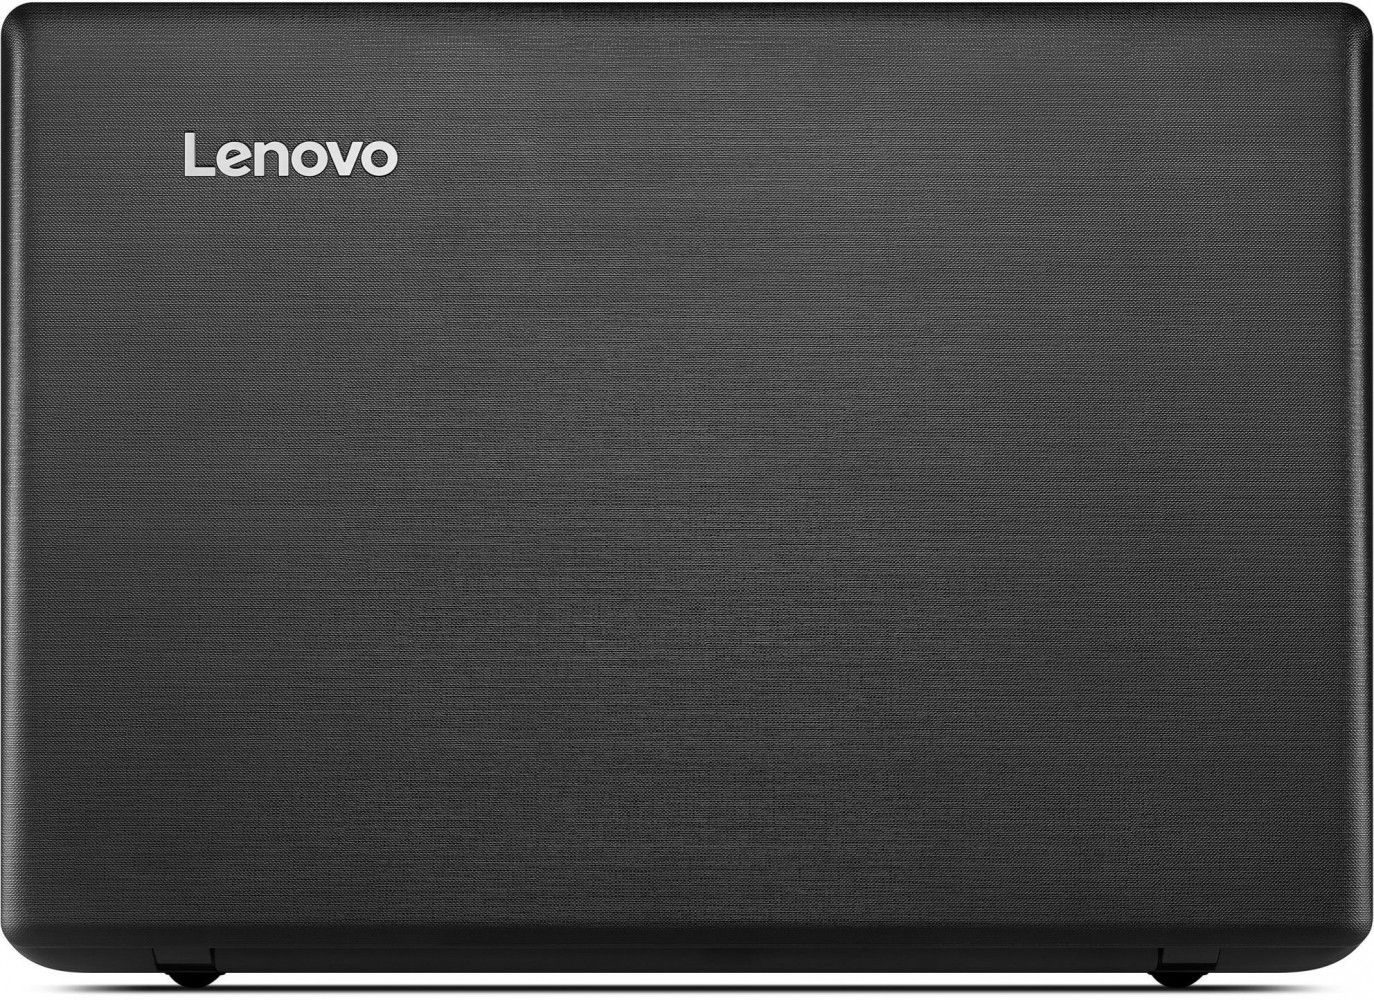 Ноутбук LENOVO IdeaPad 110-15 (80TJ009CRA) - 4